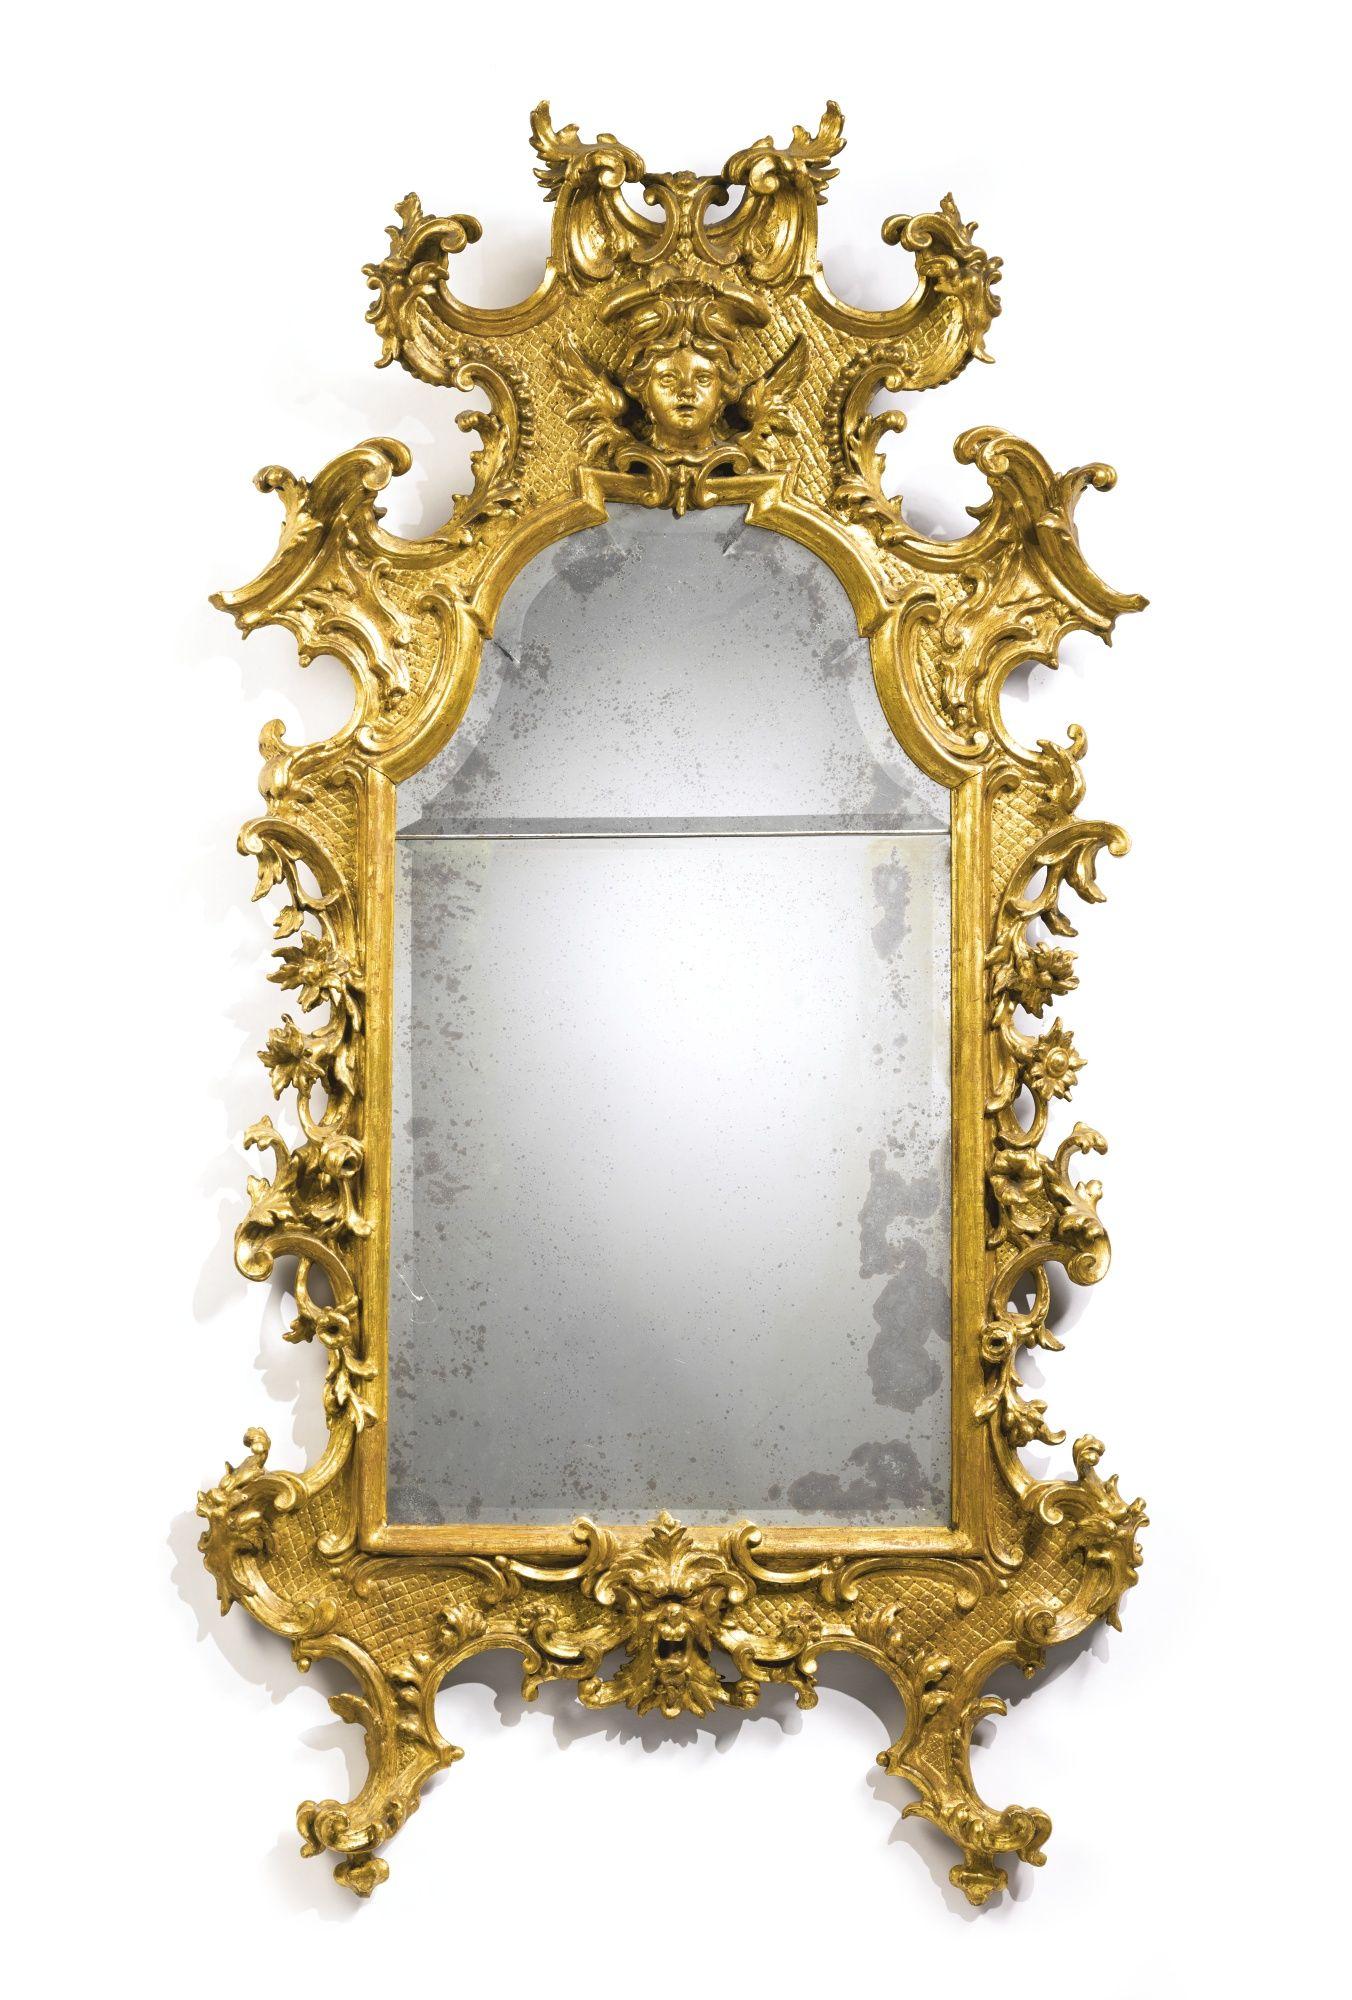 An Italian Rococo Carved Giltwood Mirror Probably Tuscany Circa 1745 Sotheby S Spiegel Rahmen Bilderrahmen Spiegel